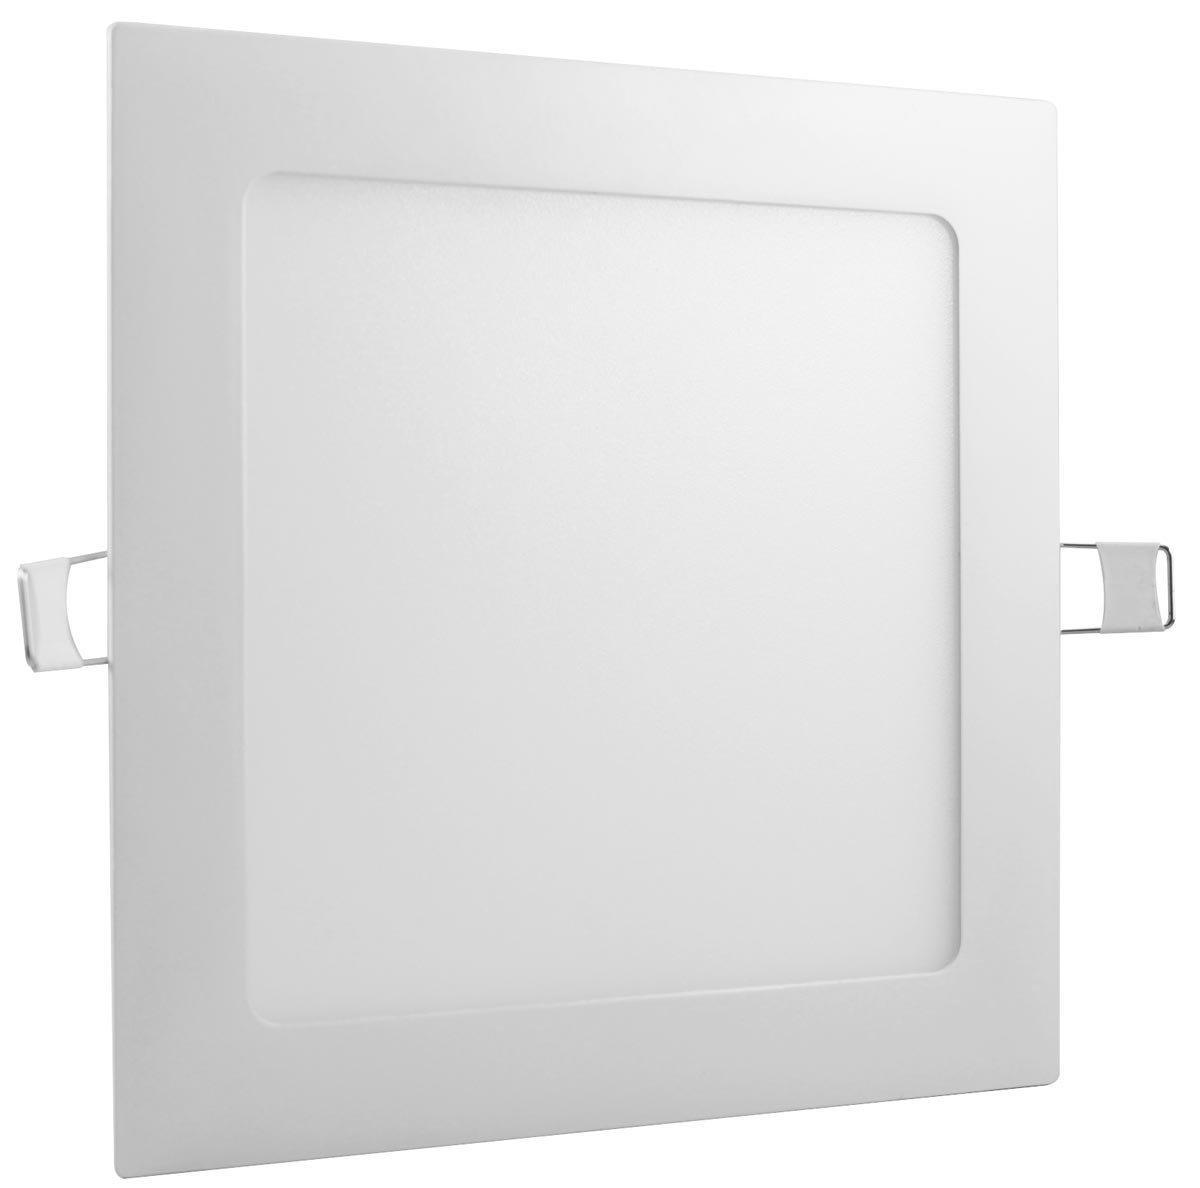 Painel Led Embutir 12w Quadrado 6500k - Luz Sollar